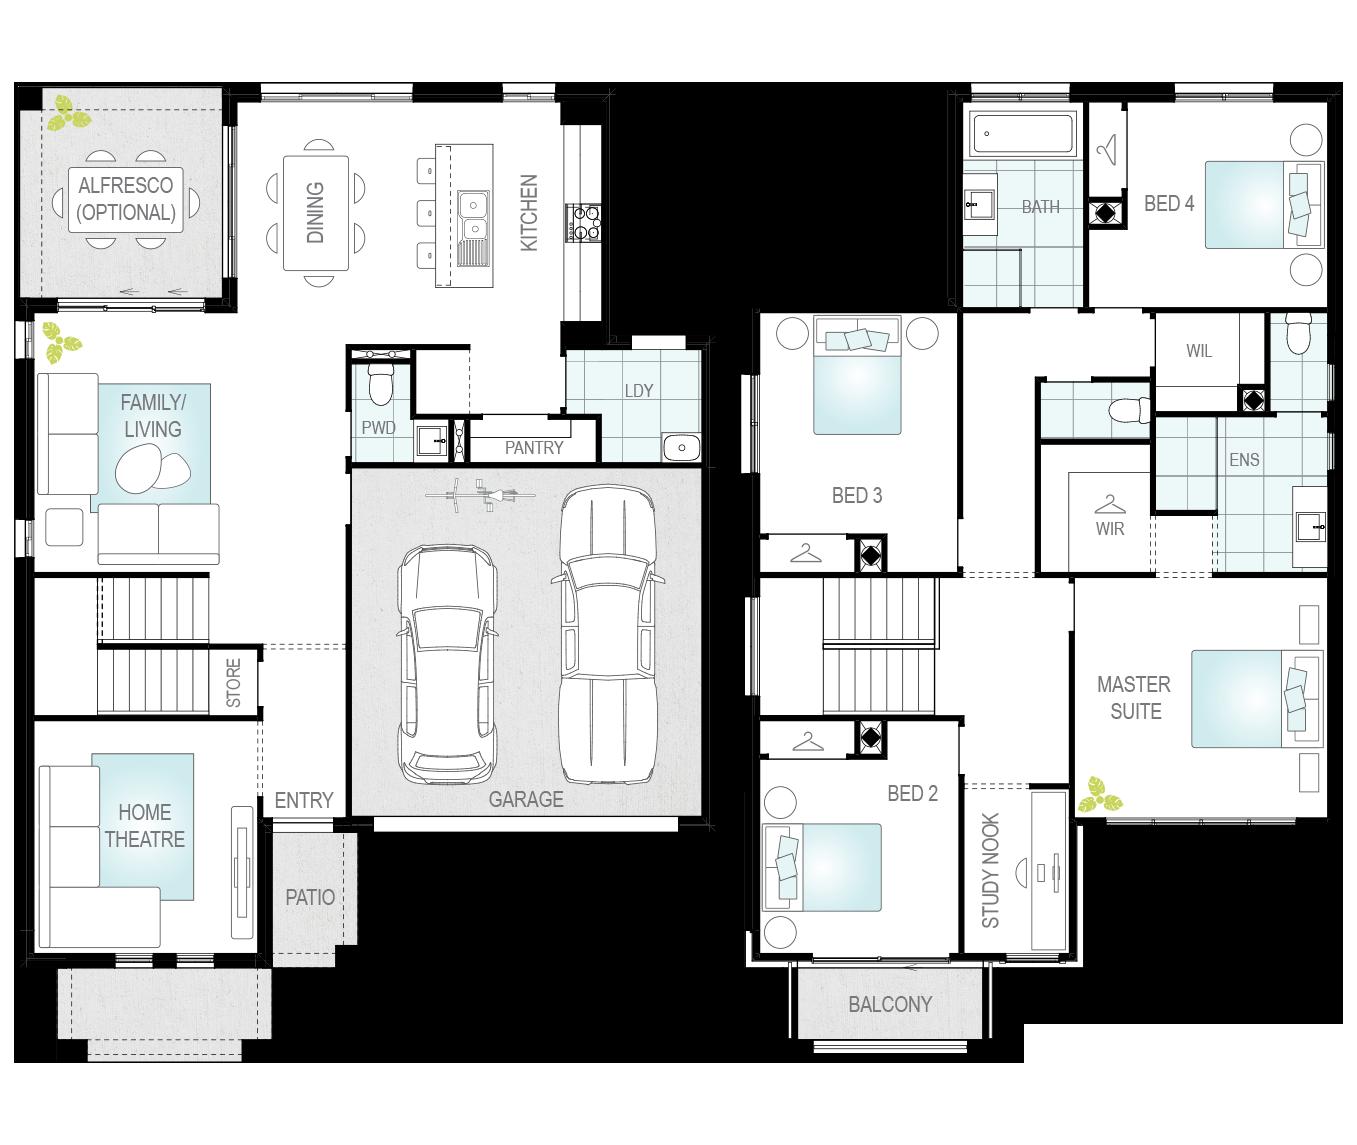 Lurento One floor plan_1.png